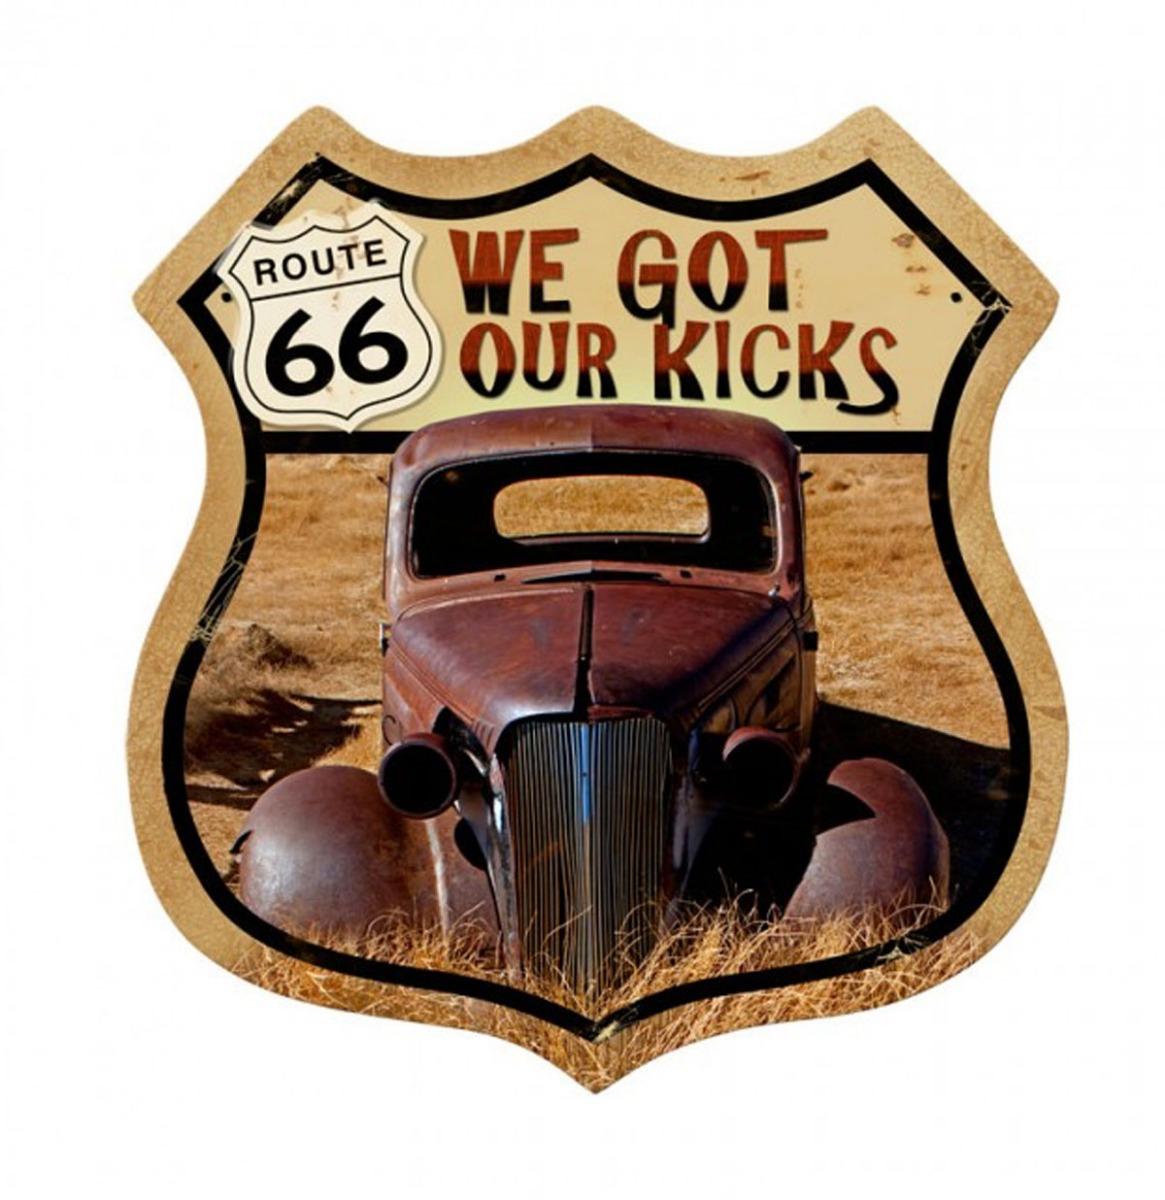 We Got Our Kicks Route 66 US Zwaar Metalen Bord 38 x 38 cm